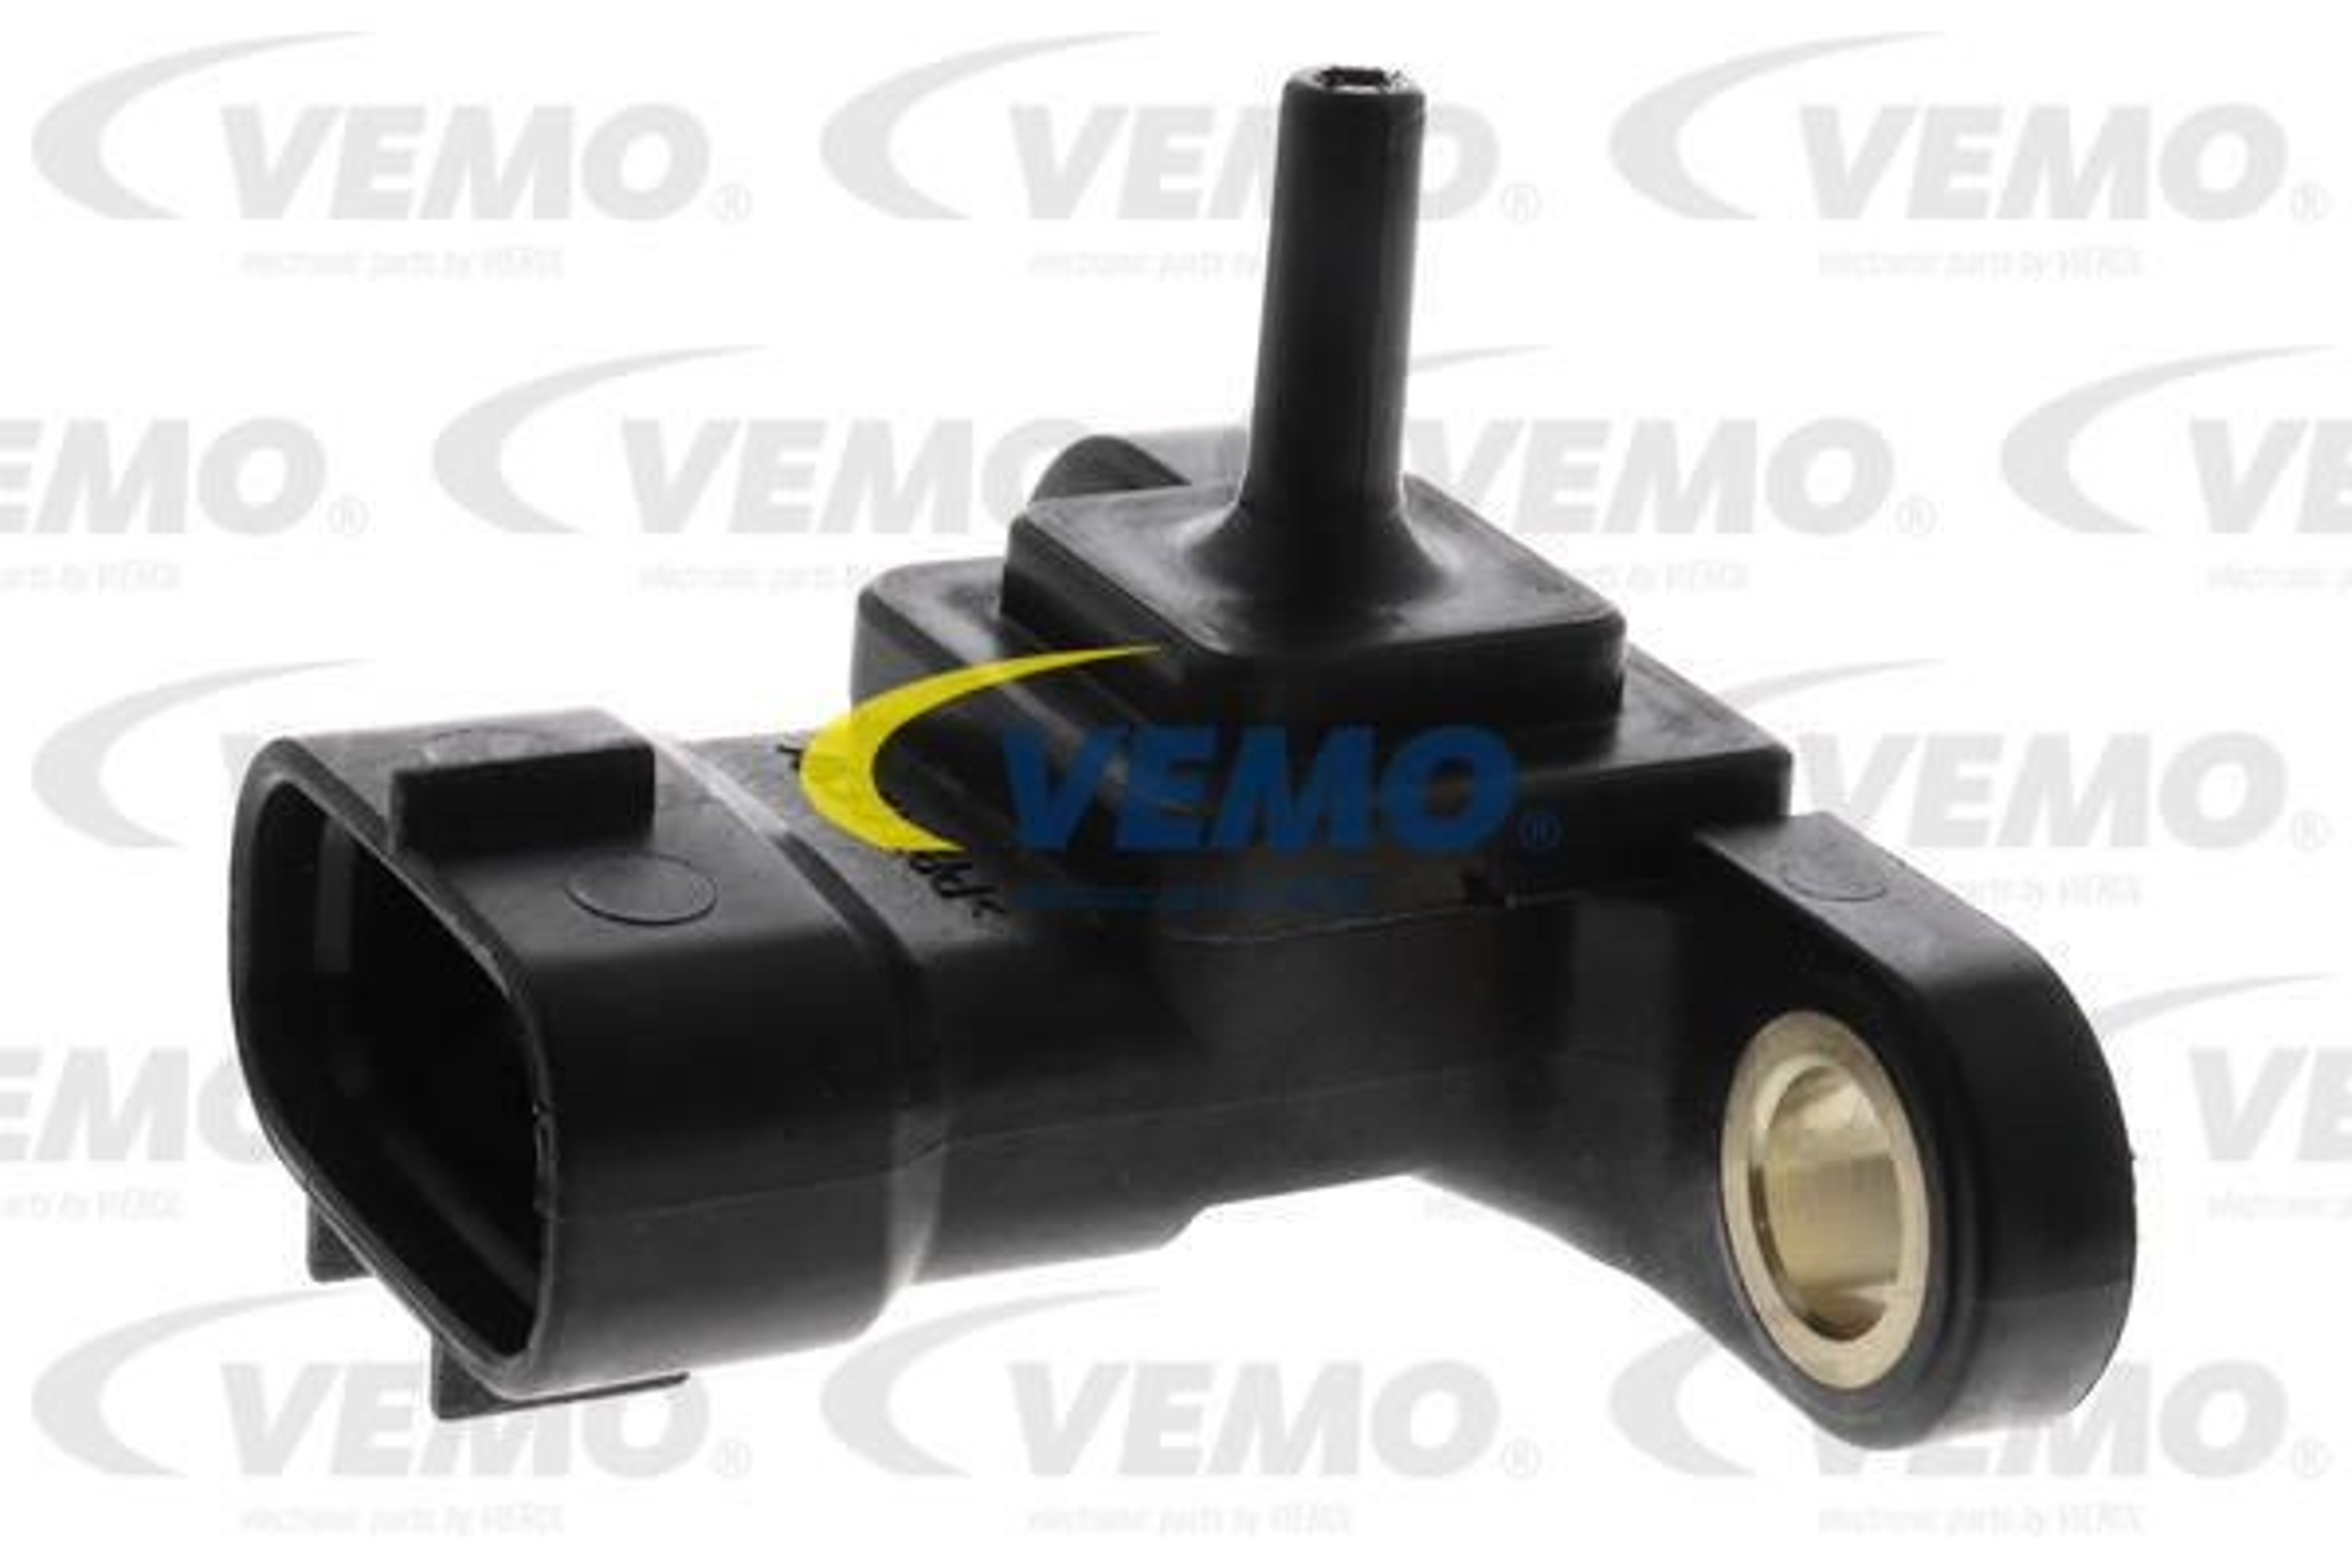 LEXUS RX Ladedrucksensor - Original VEMO V70-72-0142